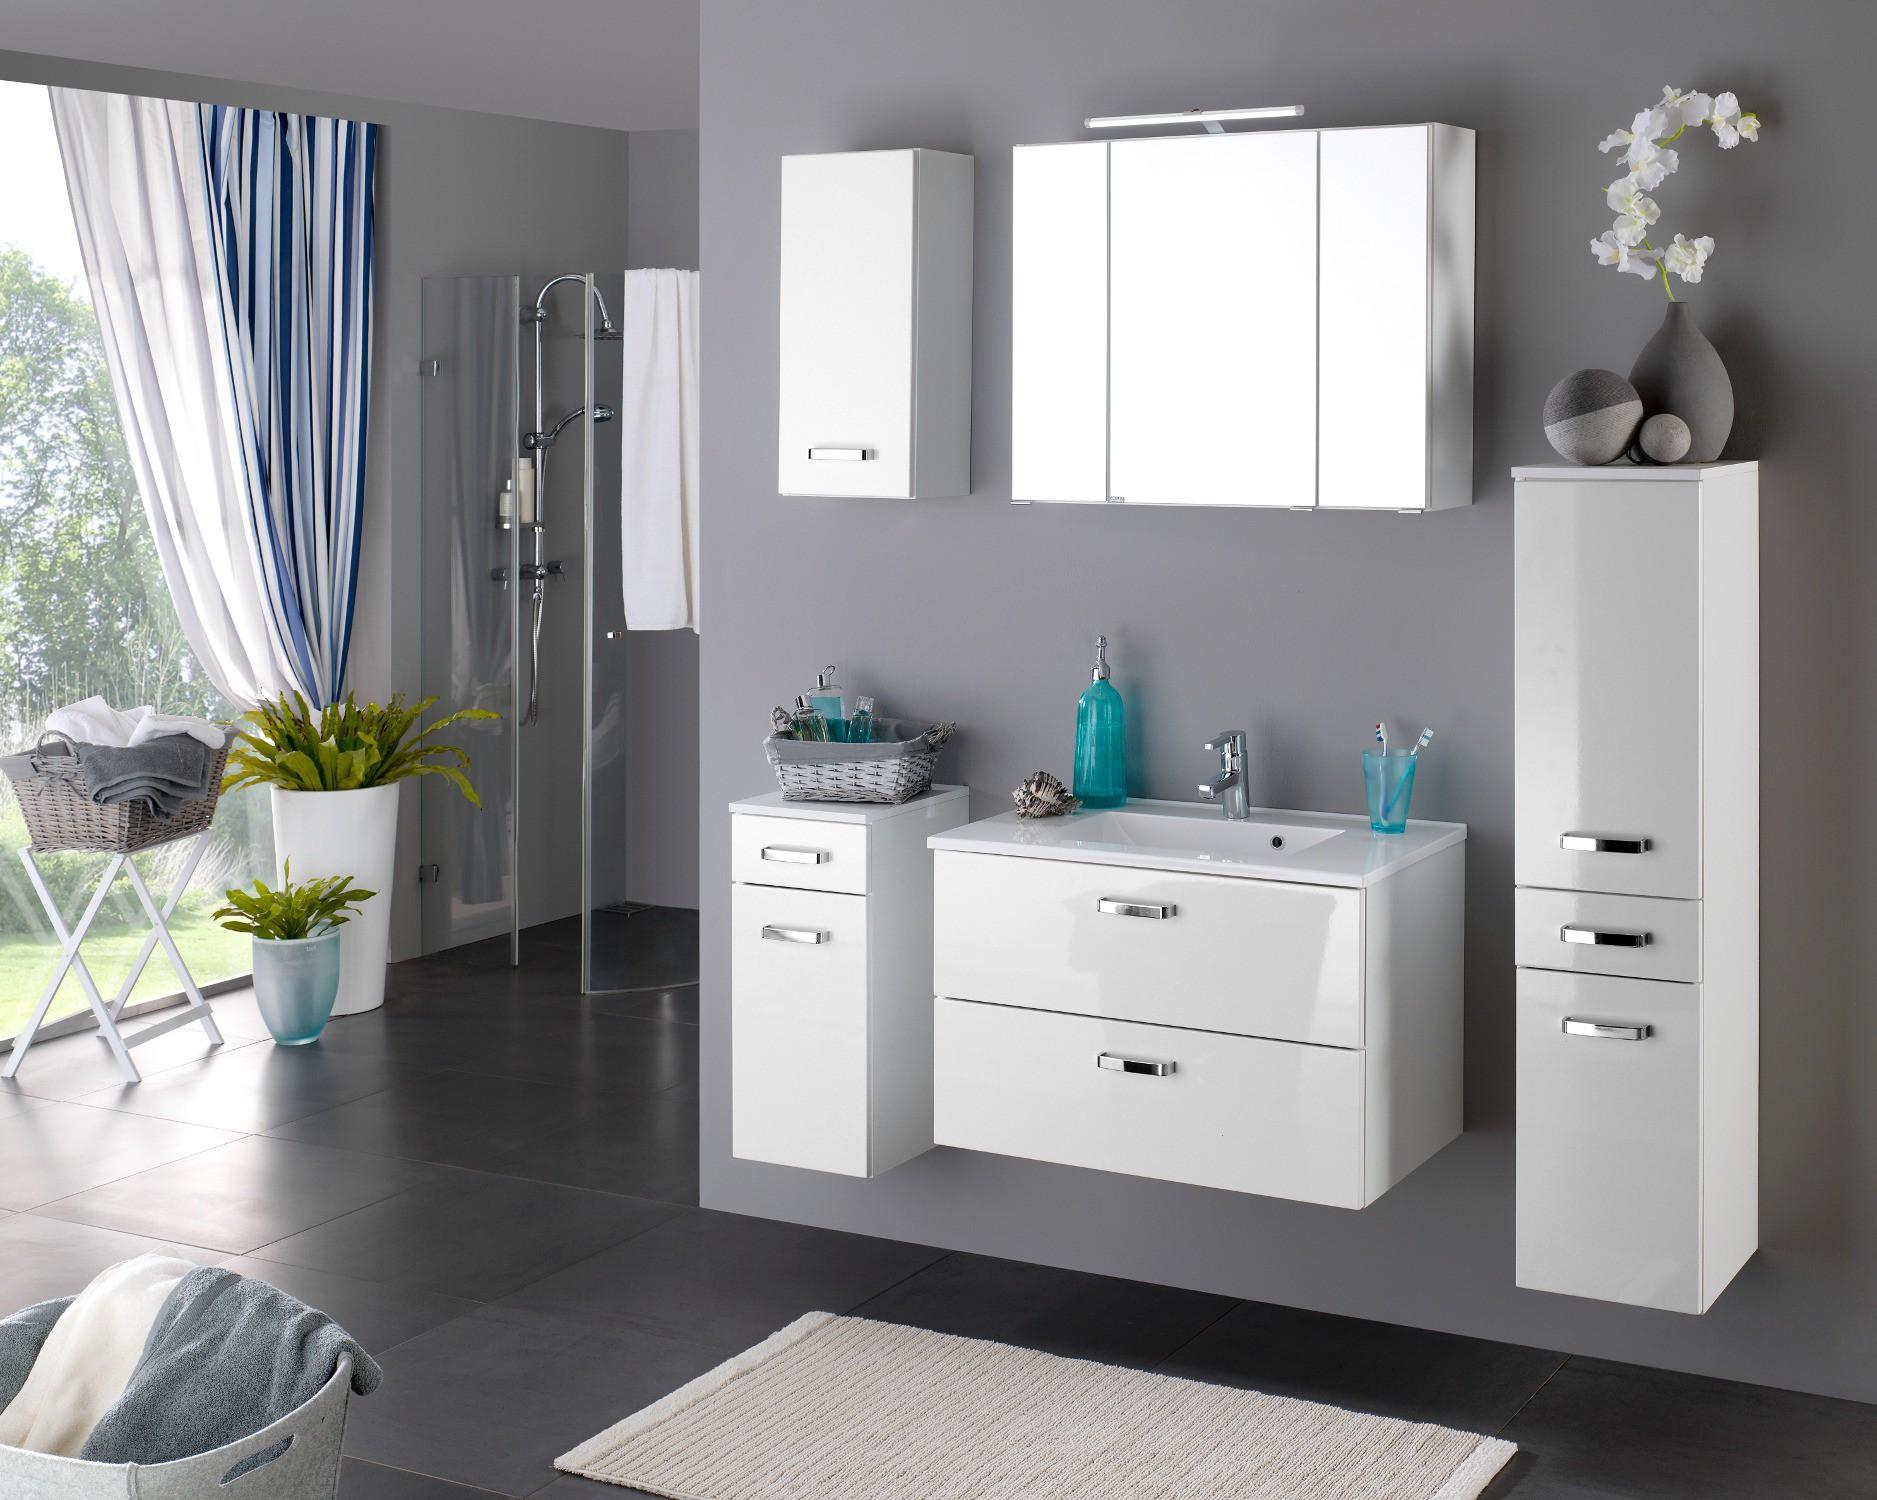 bad h ngeschrank 1 t rig 30 cm breit hochglanz wei. Black Bedroom Furniture Sets. Home Design Ideas